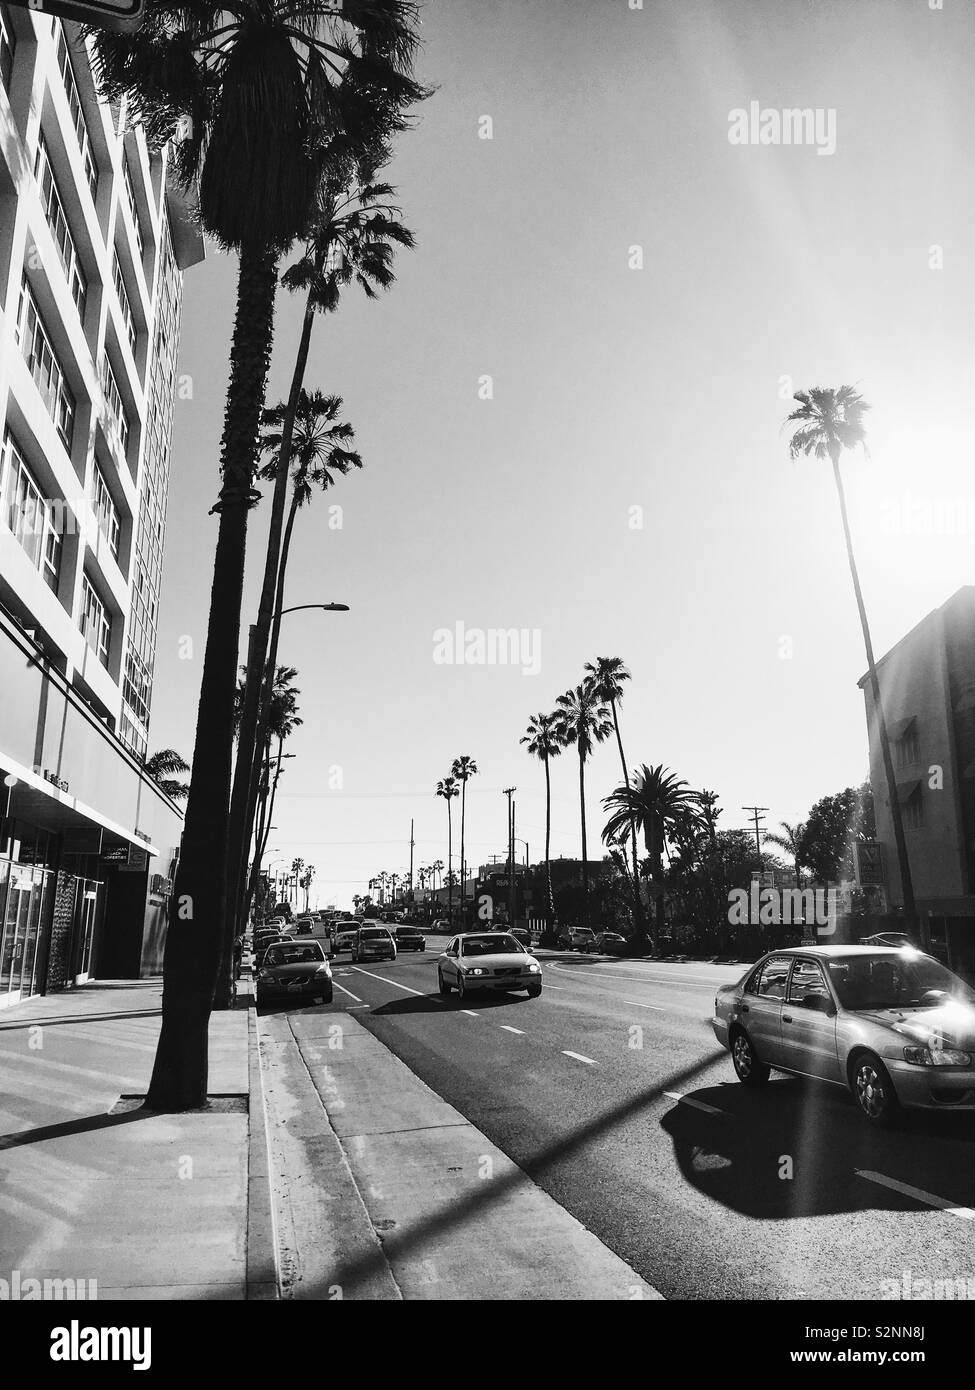 Black & white street view. LA. Stock Photo